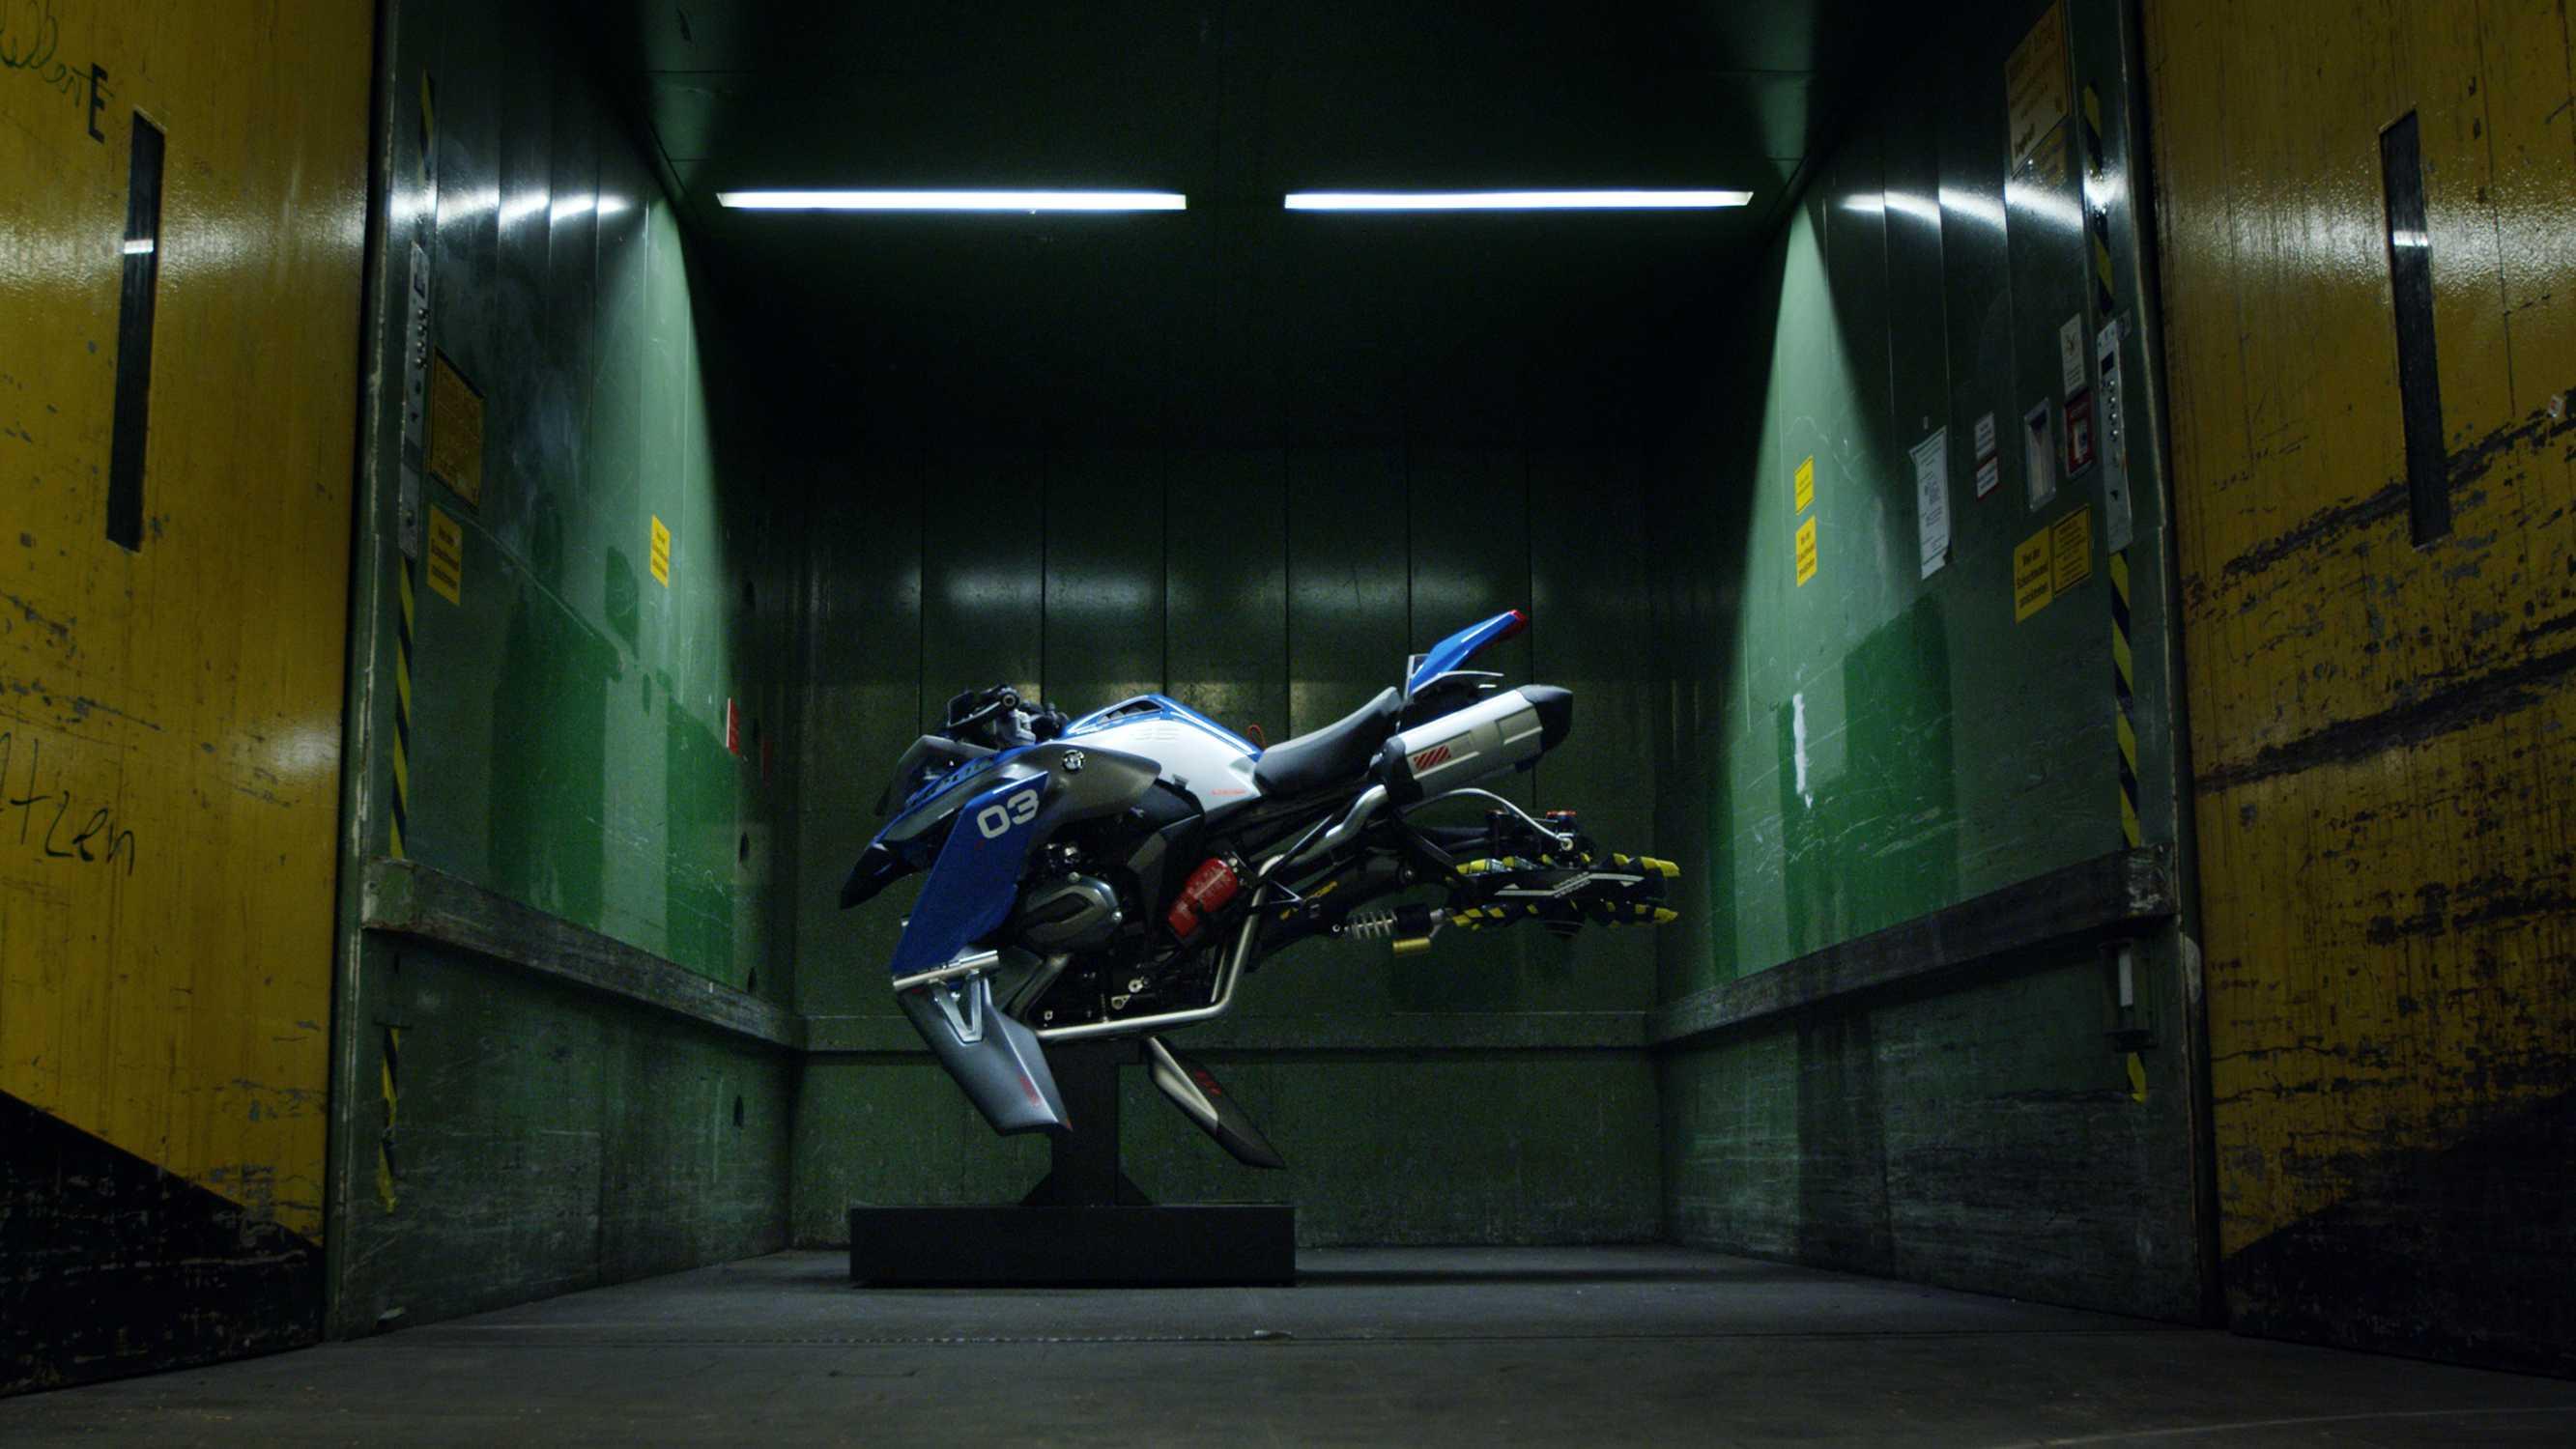 Bmw Motorrad And Lego Technic Present The Hover Ride Design Concept